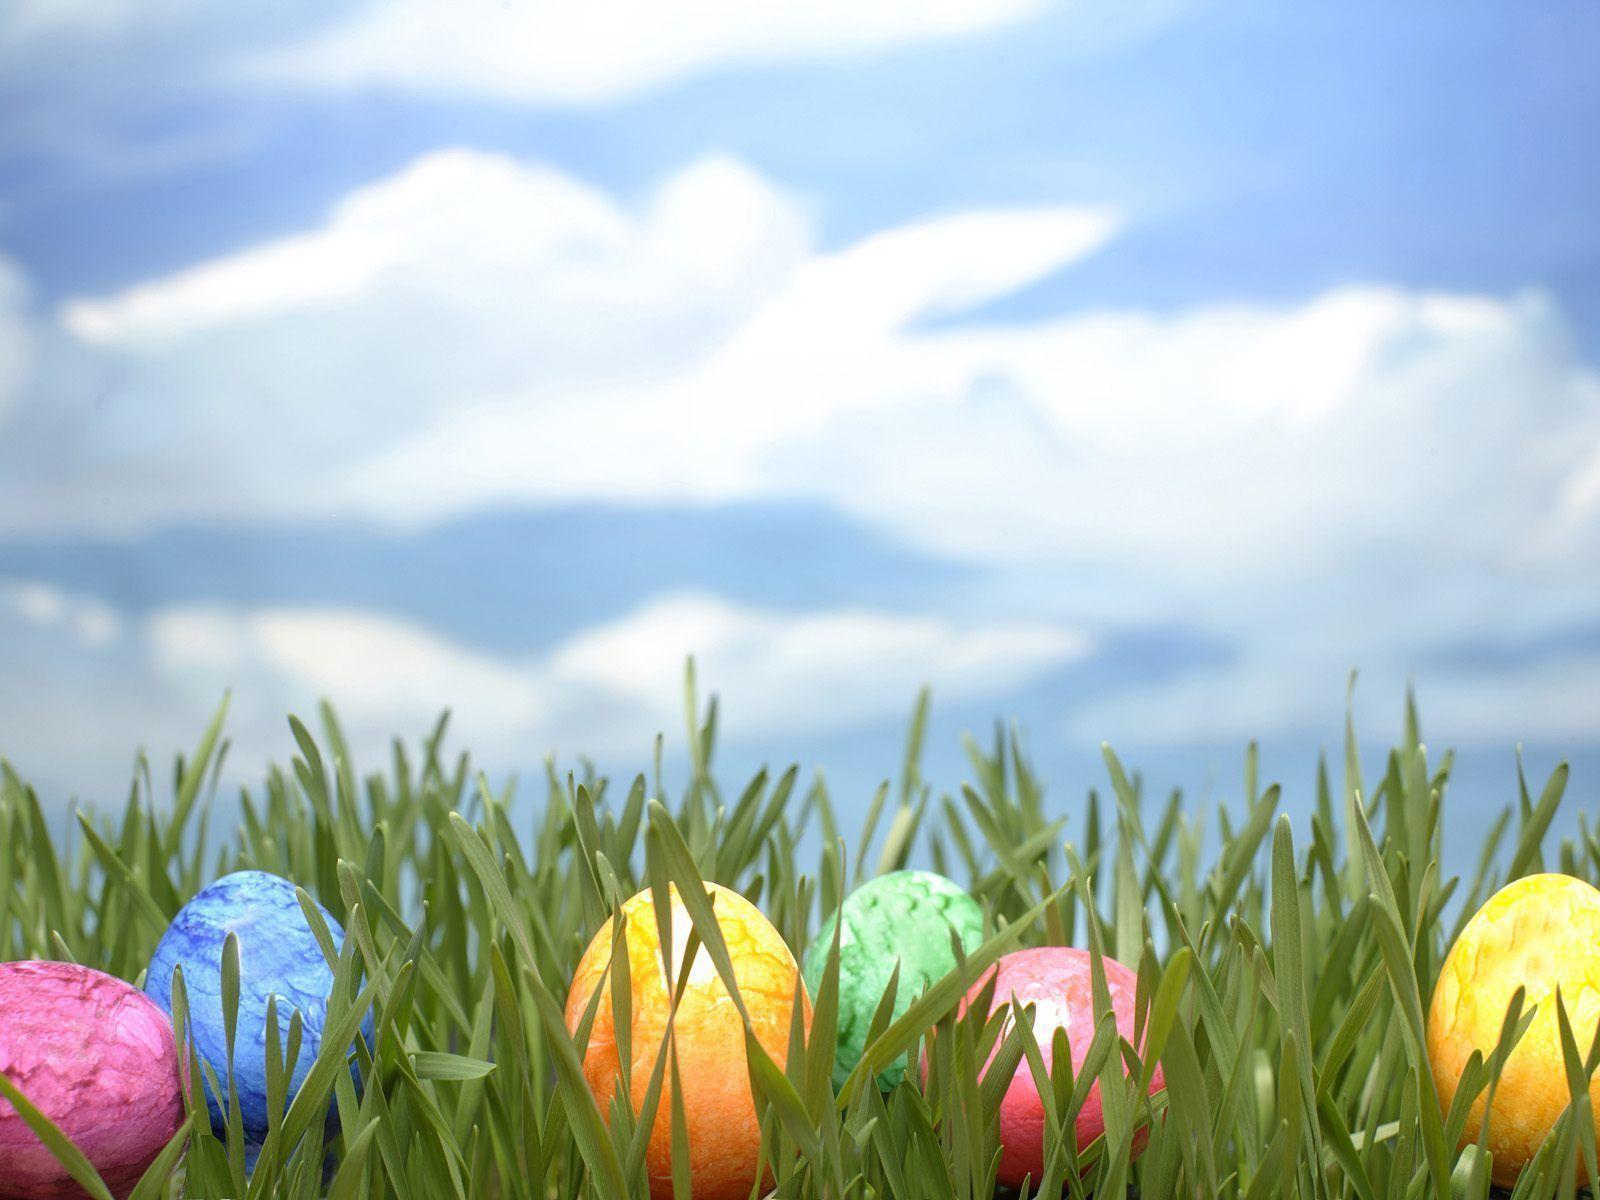 Easter Egg Wallpapers - Wallpaper Cave